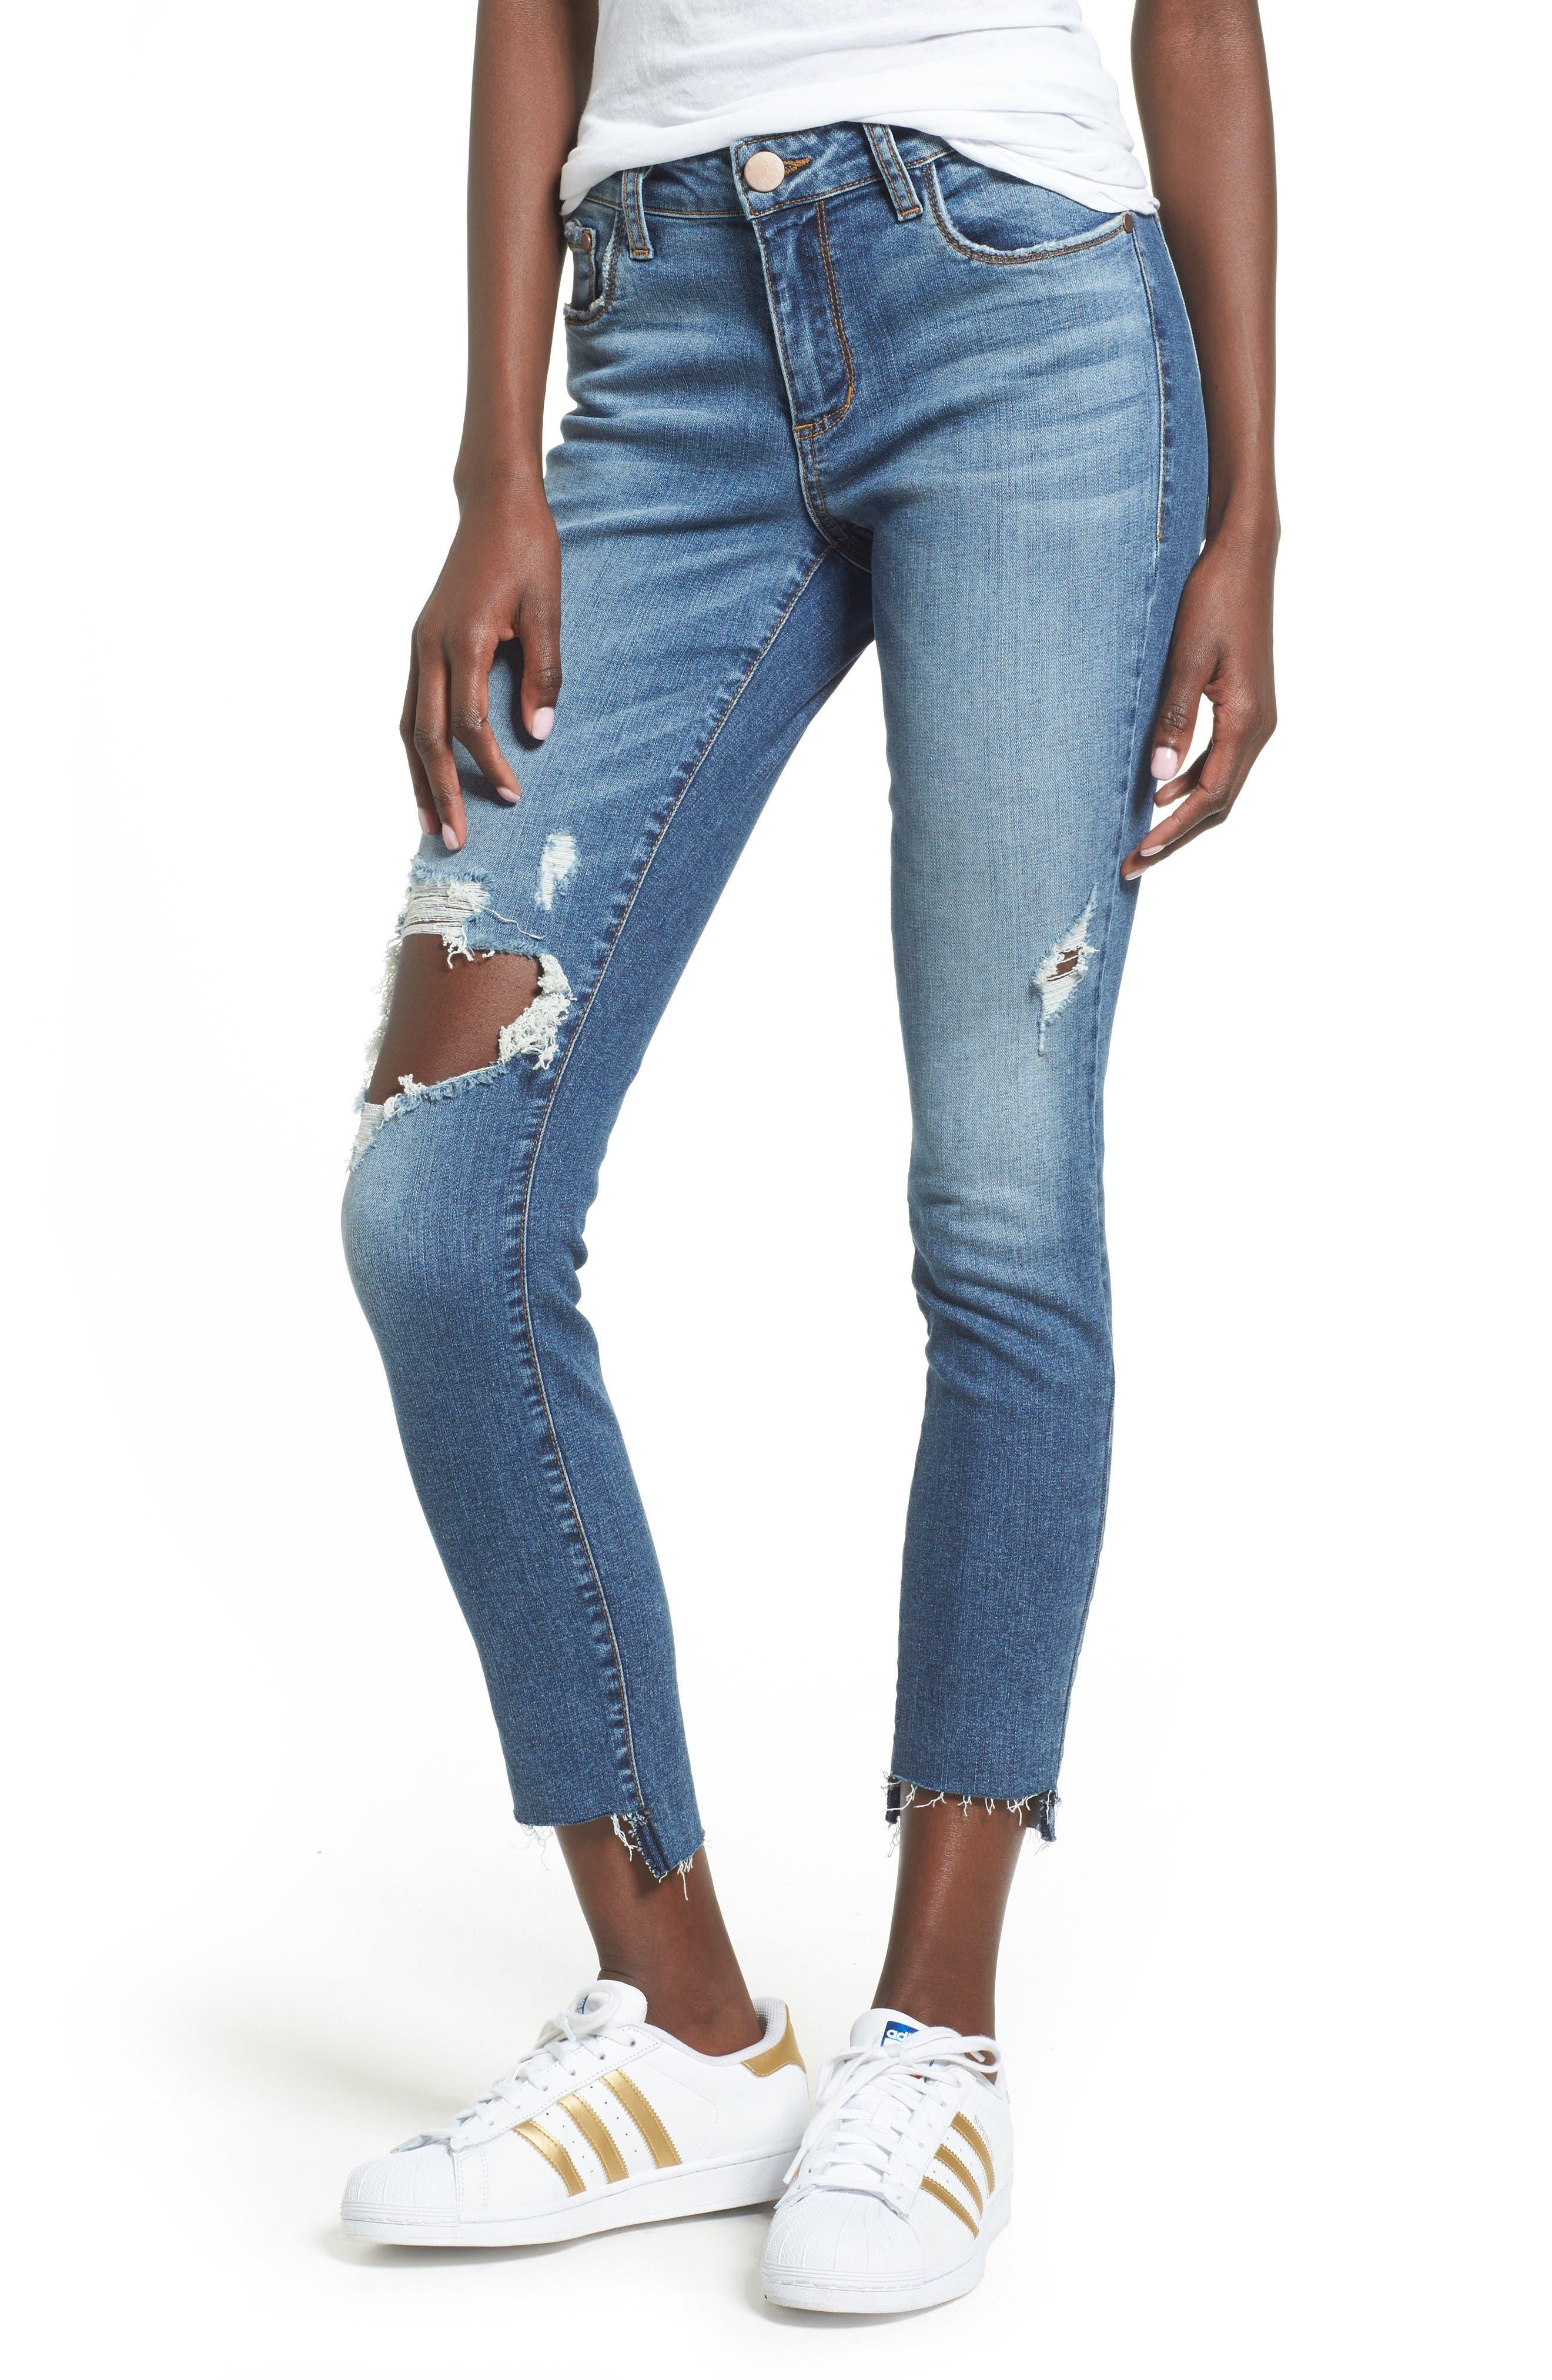 Alternate Image 1 Selected - BP. Ripped Step Hem Skinny Jeans (Destroy Rinse)